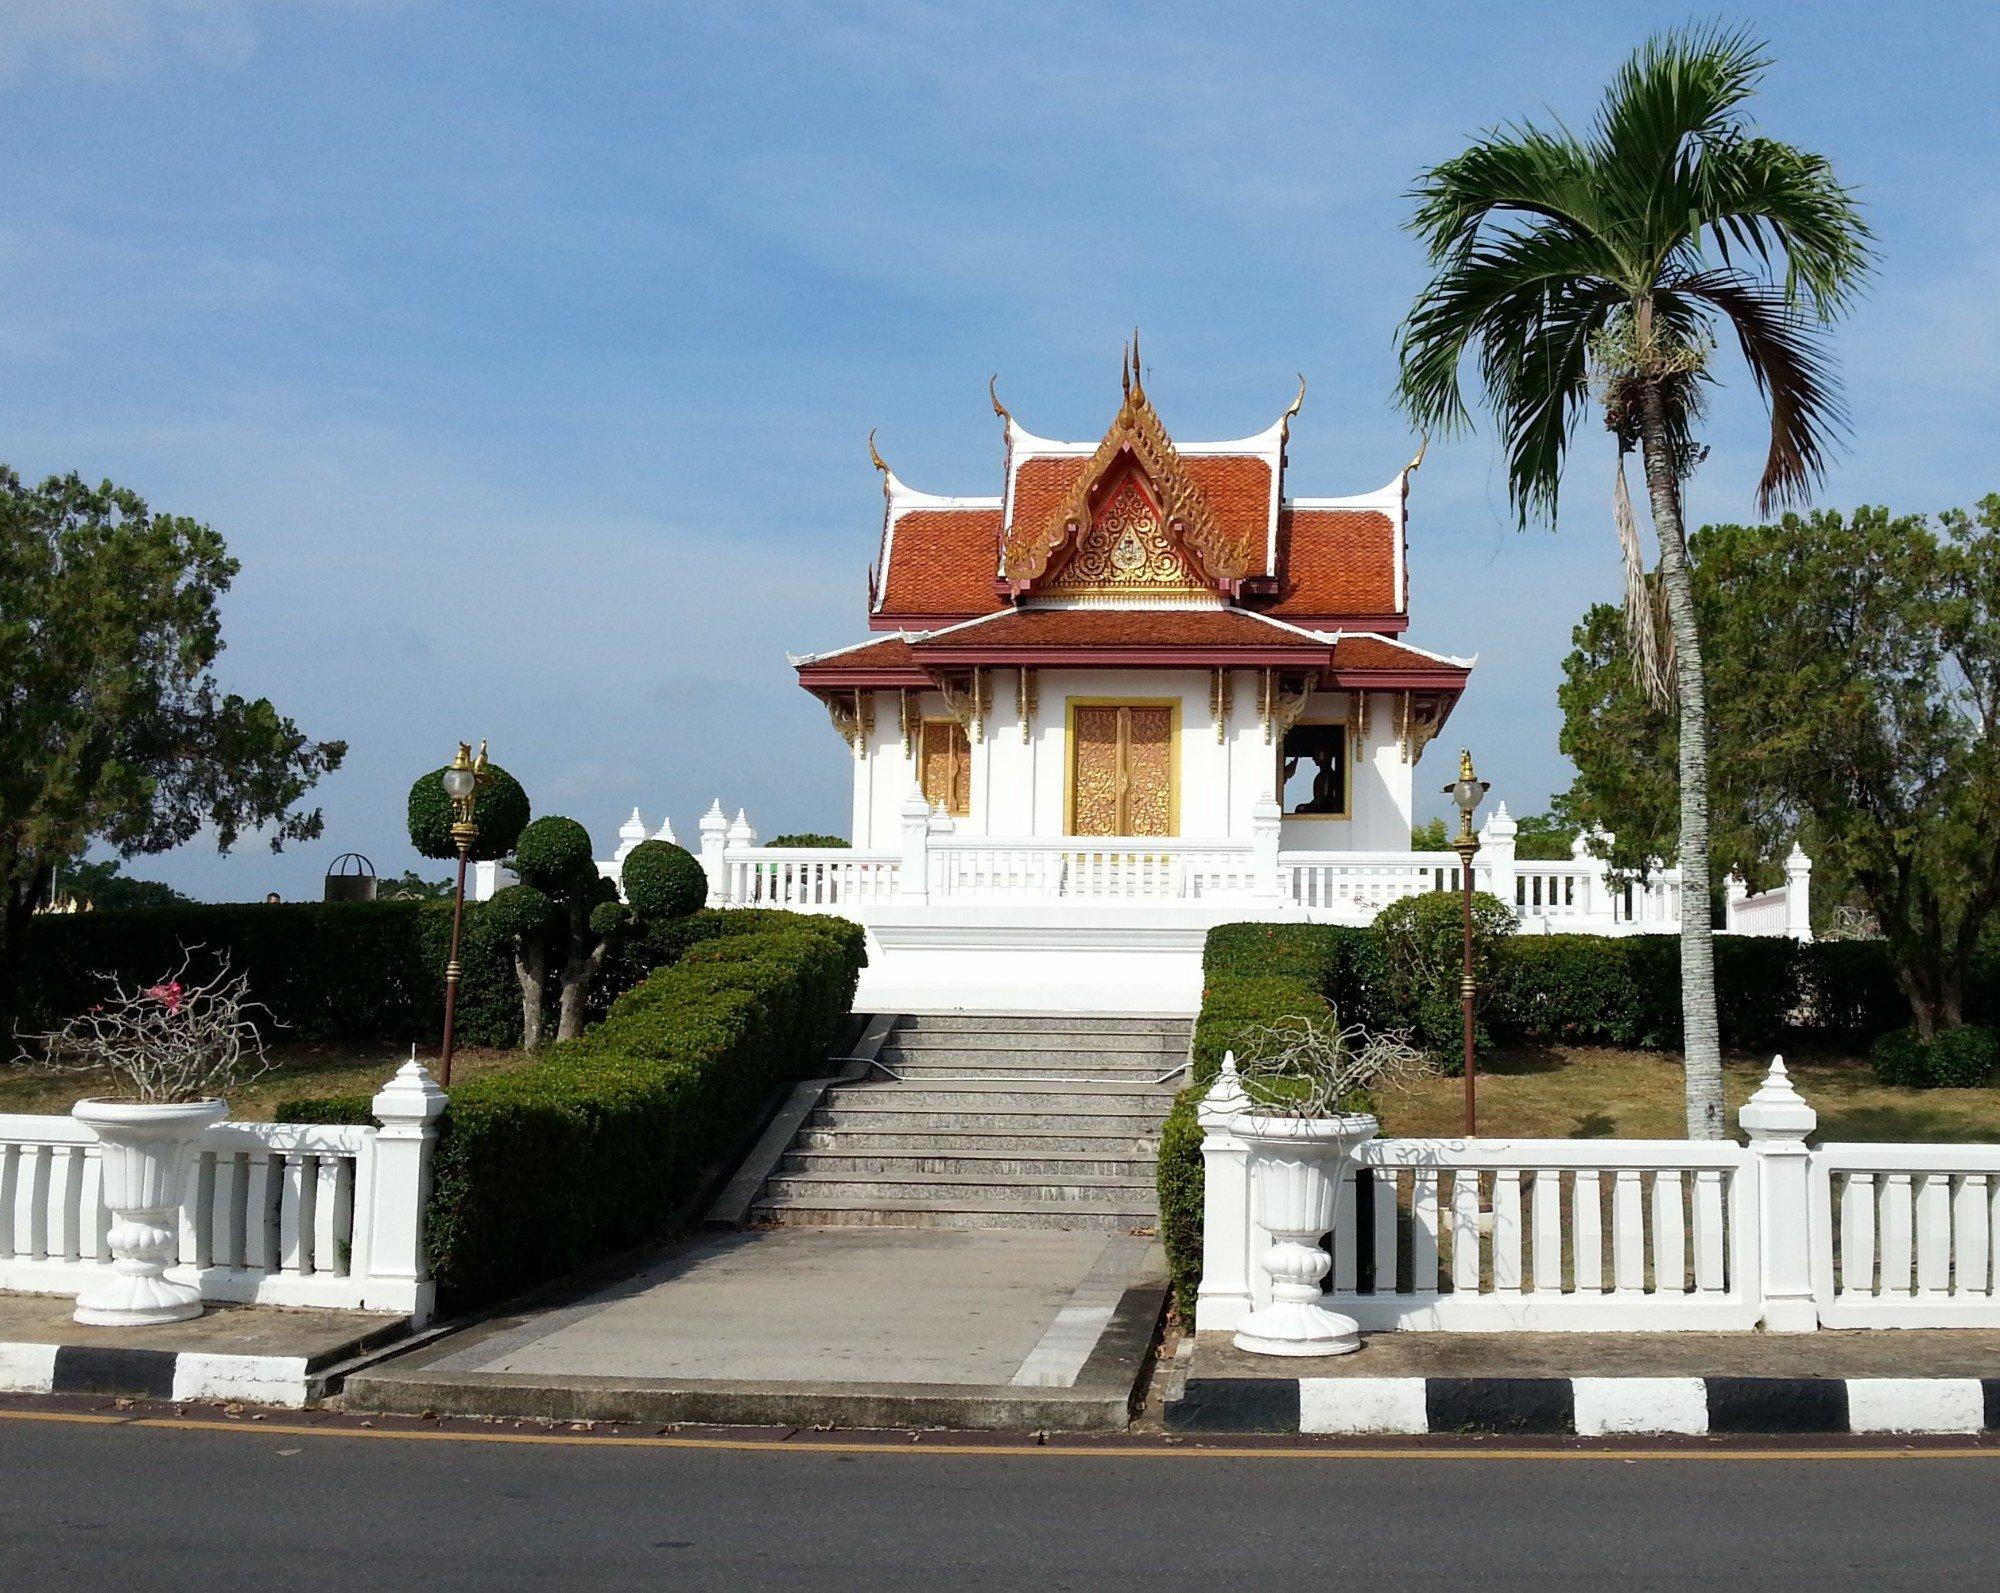 Building housing the Phra Phuttha Nirokhantrai Chaiwat Chaturathit